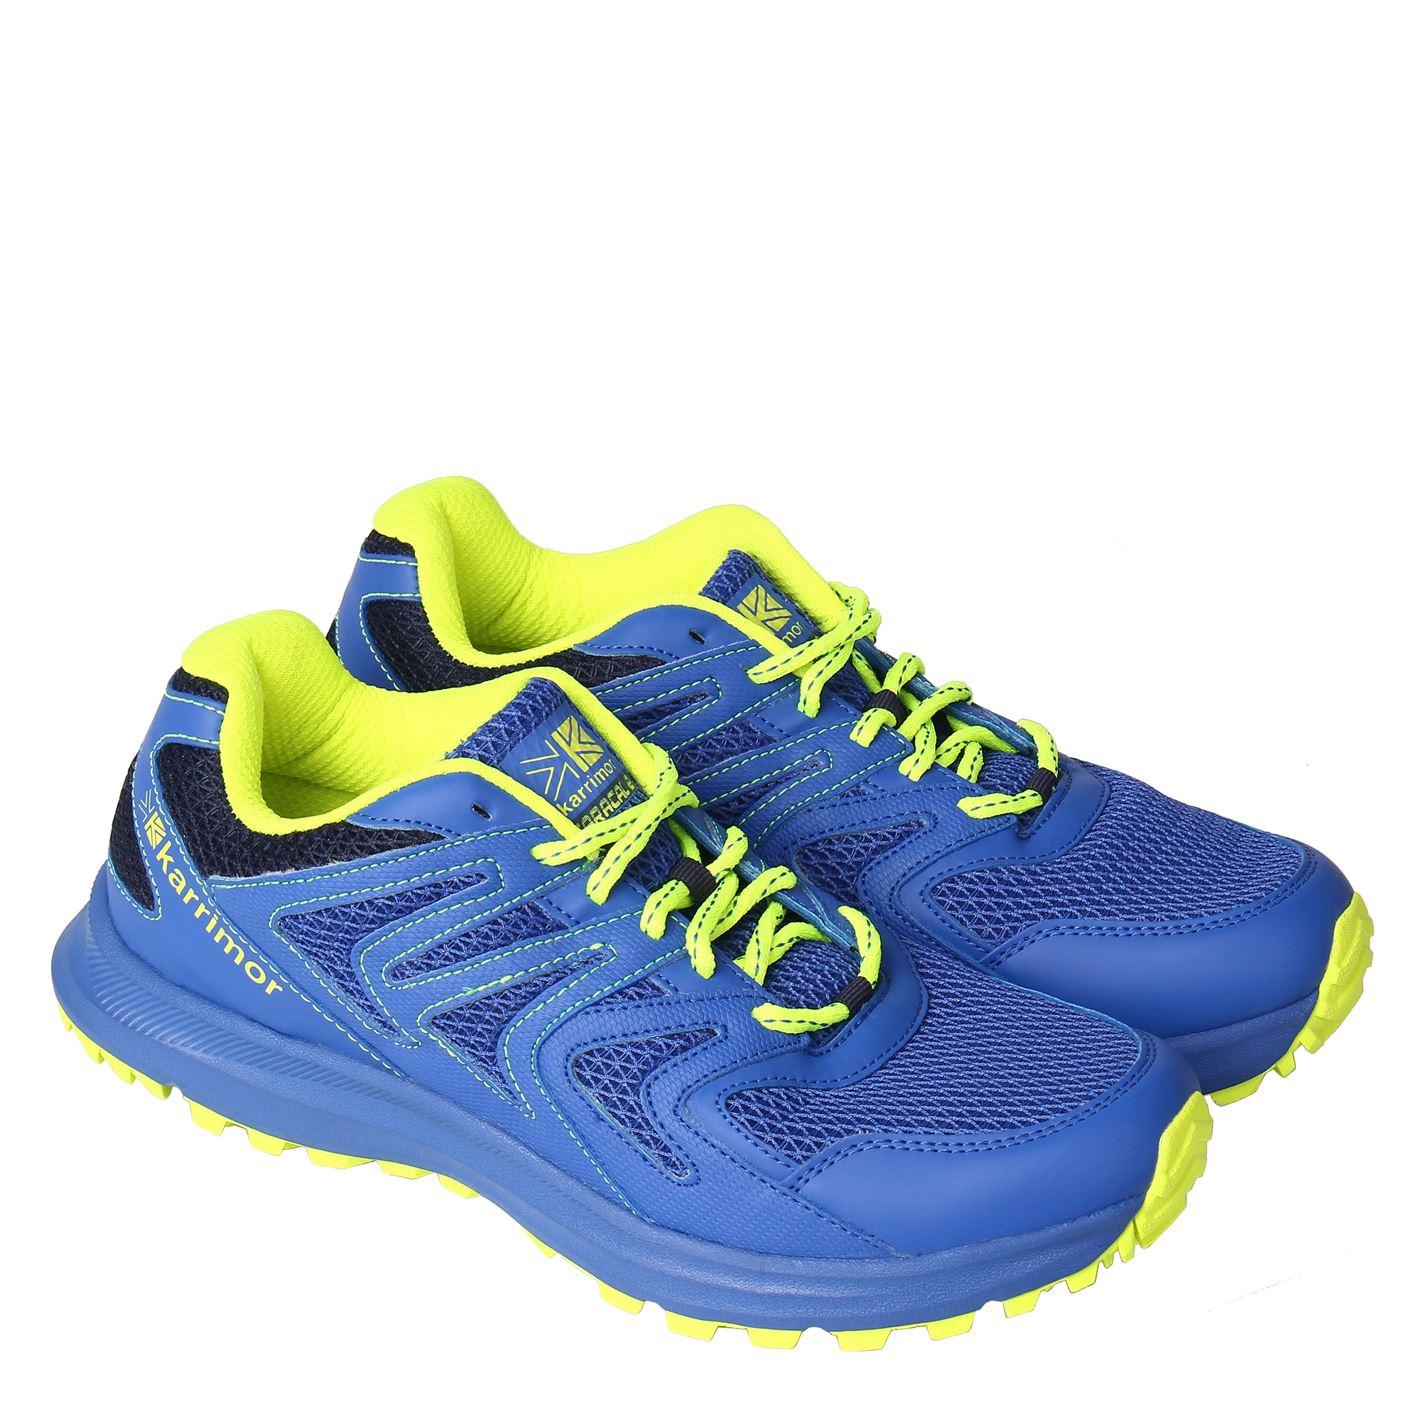 76843d893 Pánske topánky   Karrimor Caracal Mens Trail Running Shoes Blue/Lime ...